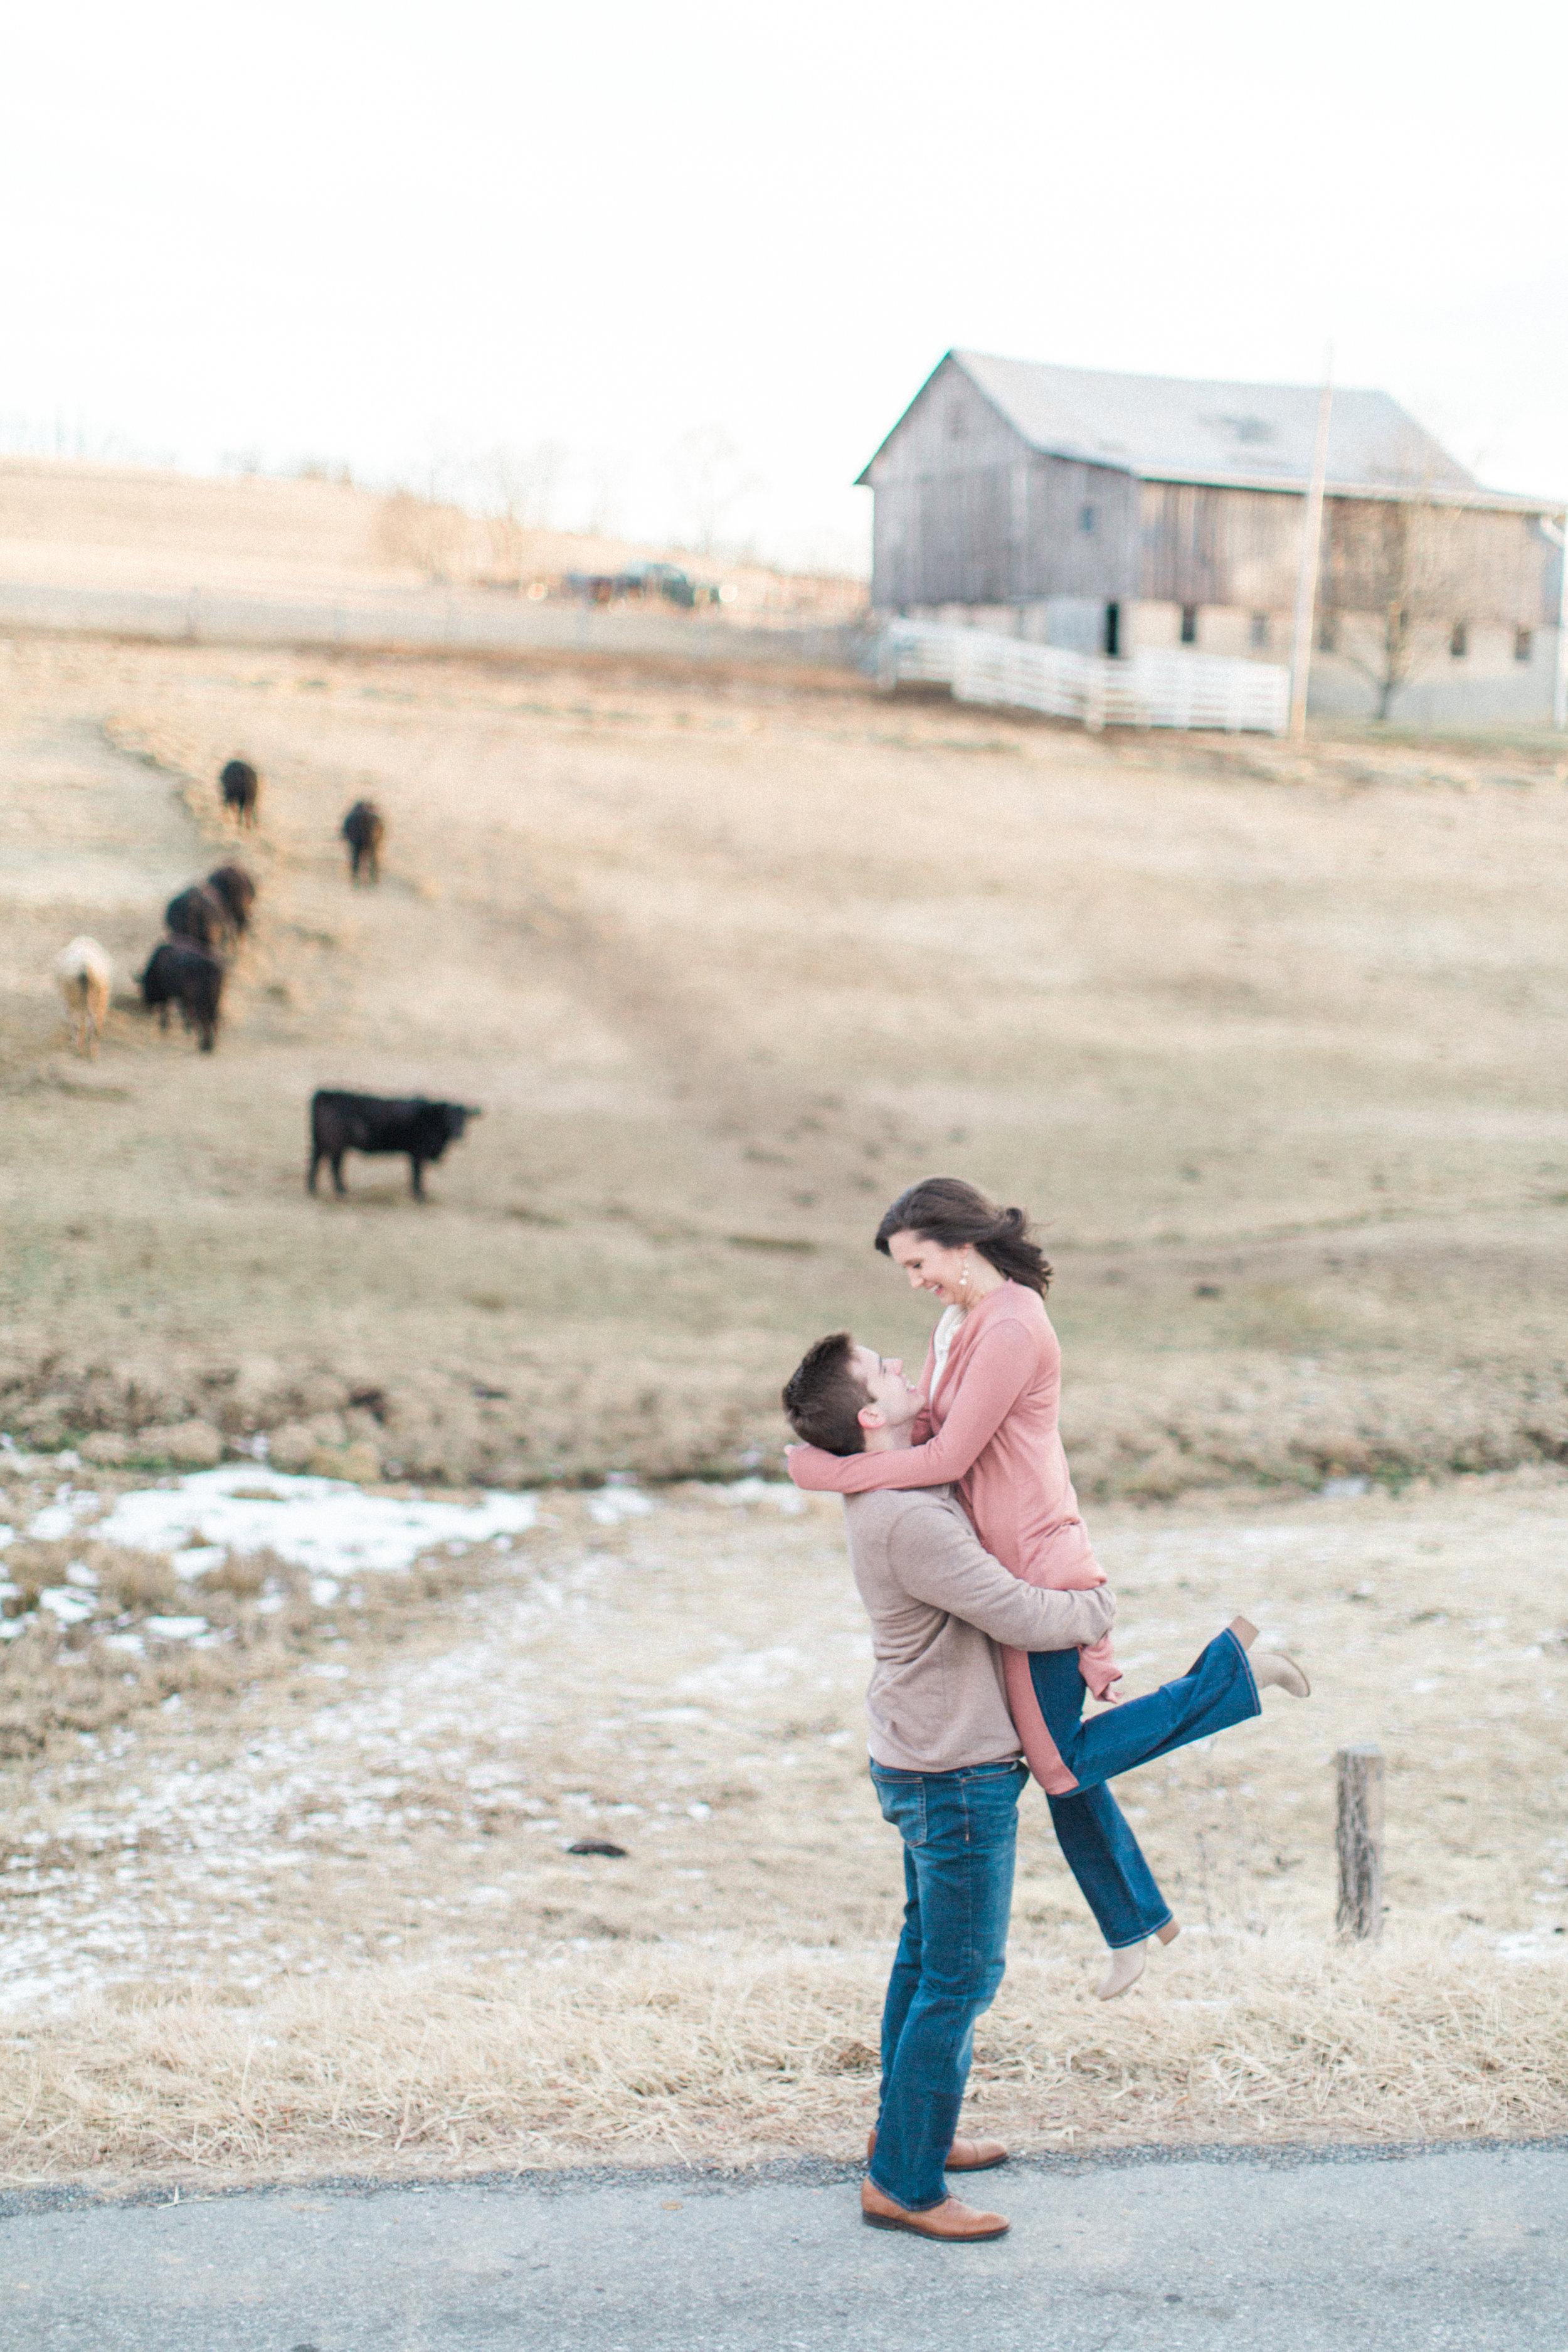 Abigail_Jill_Photography_Maryland_Engagement_Farm_Emily_Justin31.jpg